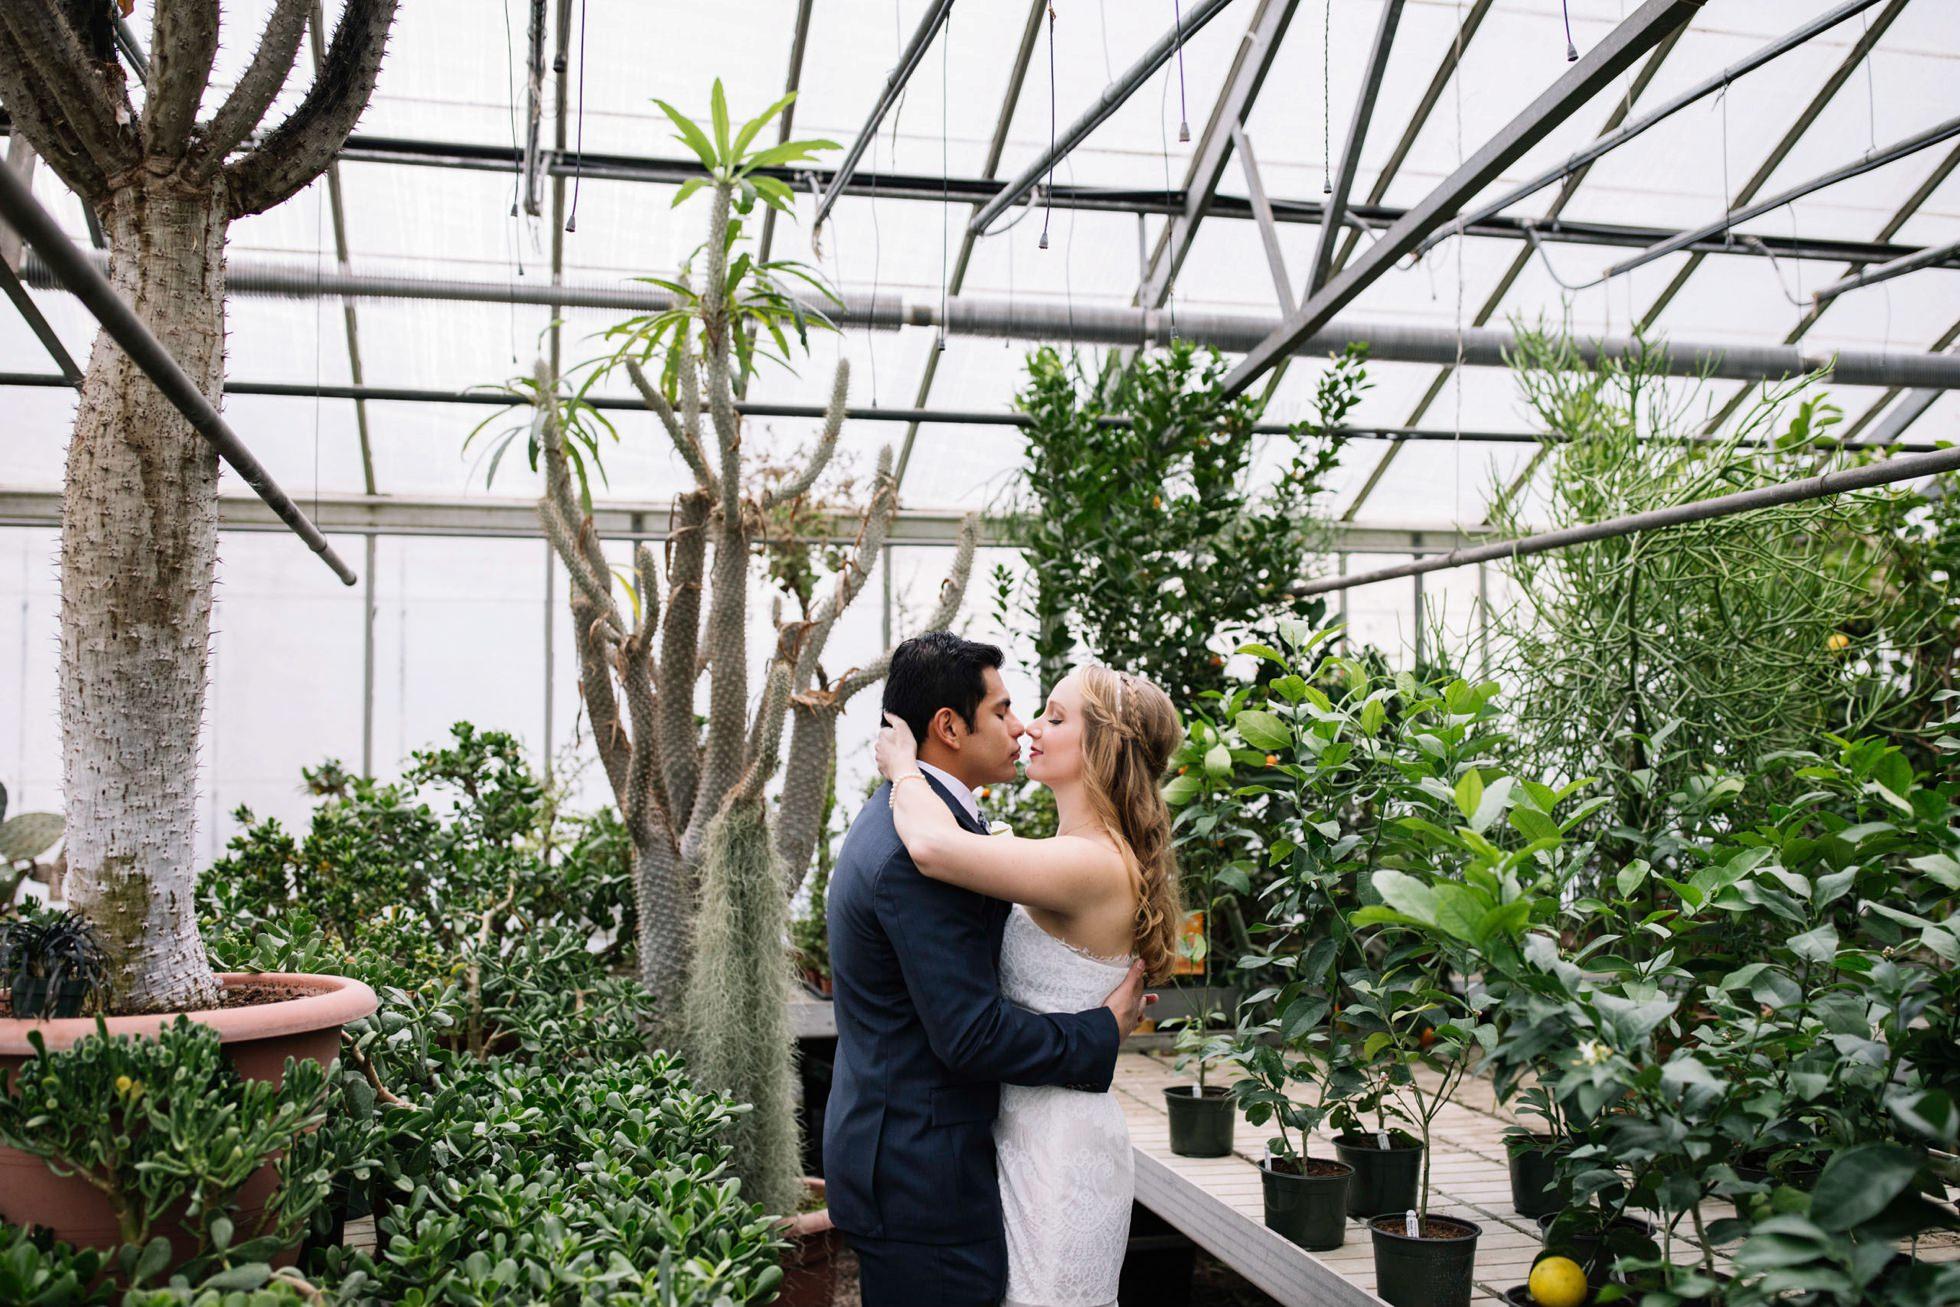 otts greenhouse engagement session